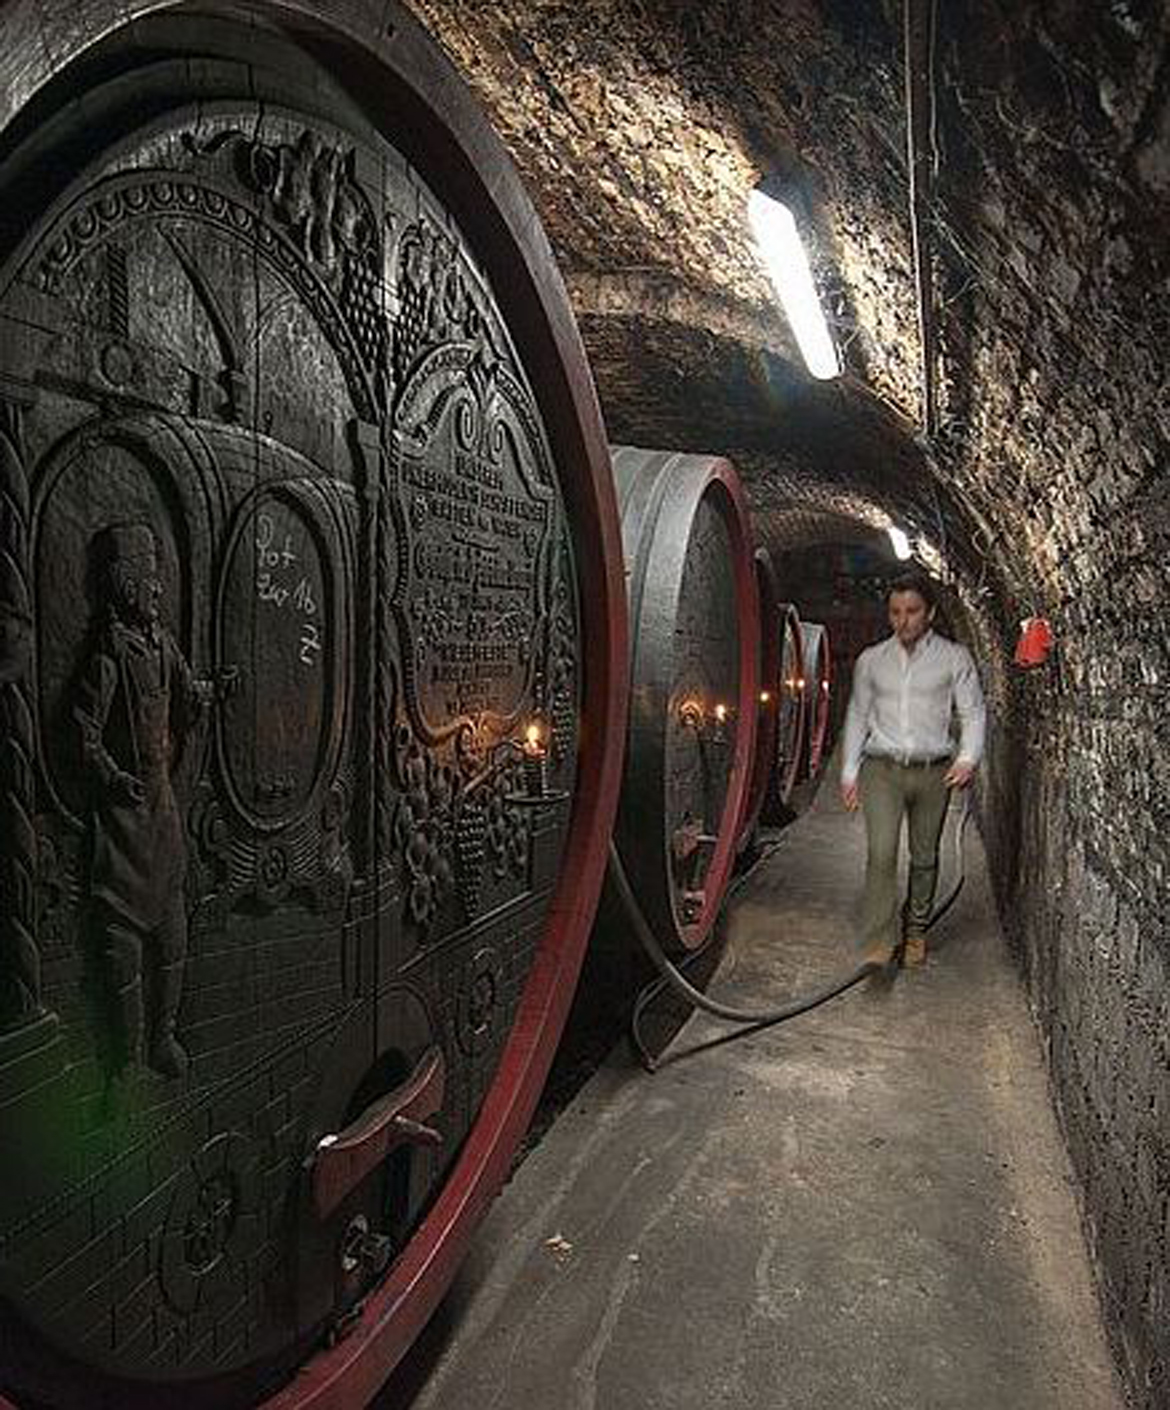 Weingut Mittelbach barrels